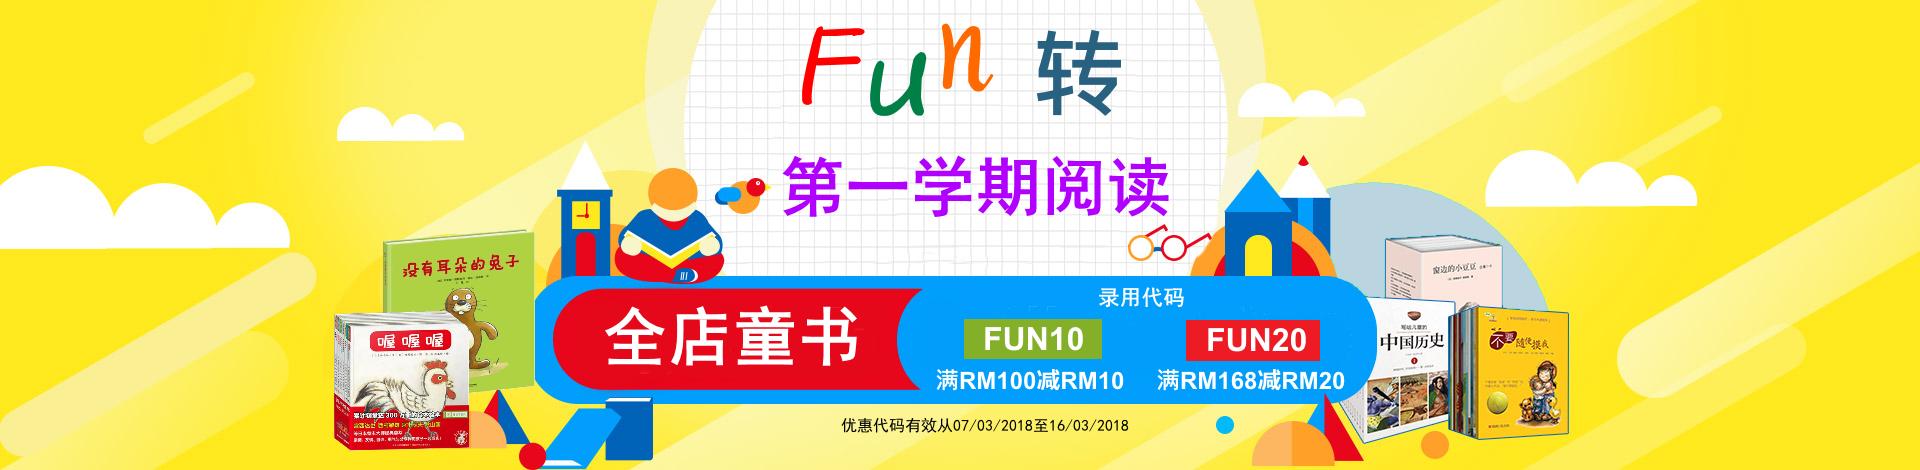 FUN转第一学期阅读,满RM100减RM10,满RM168减RM20